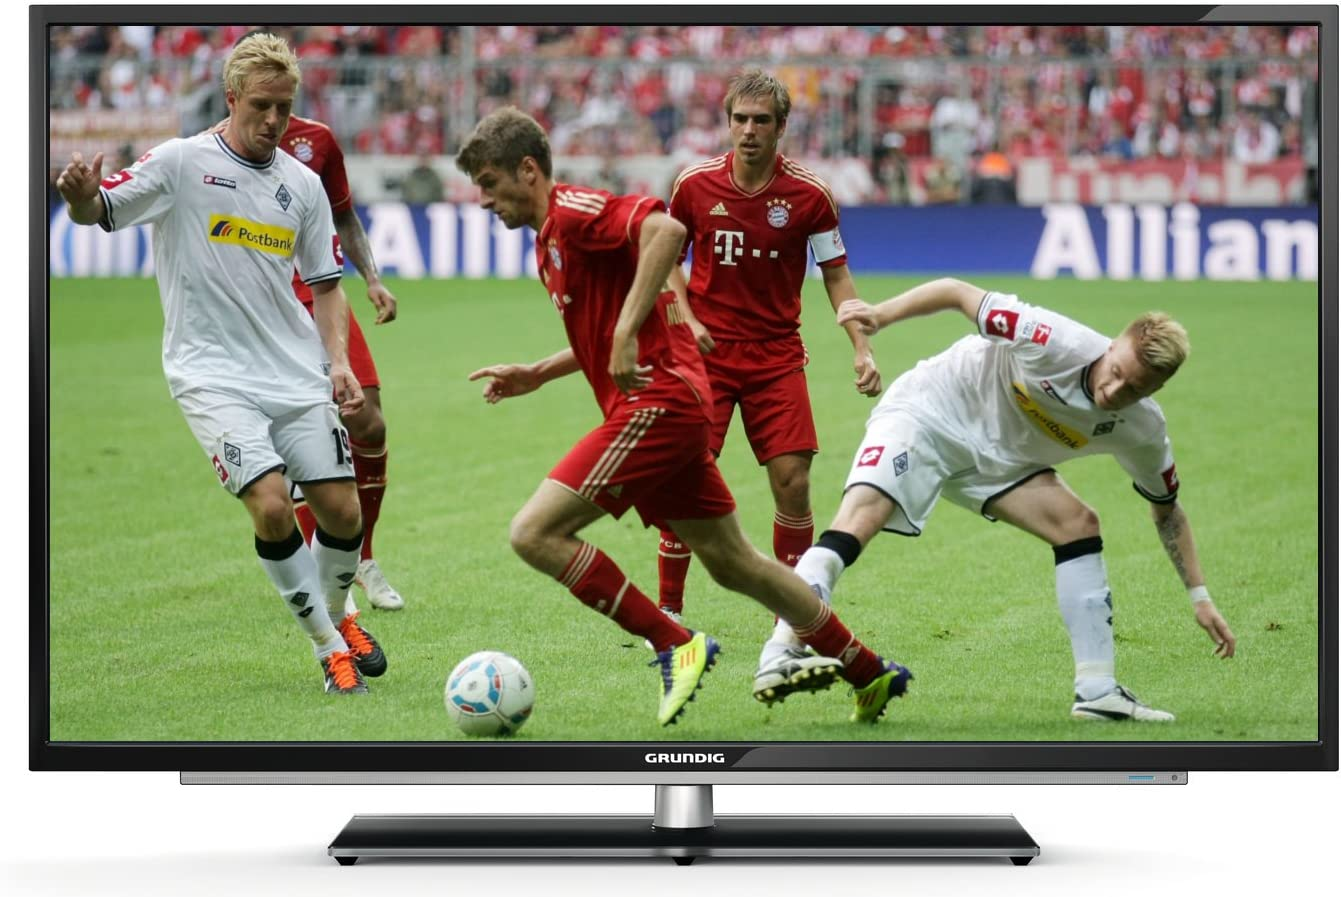 Grundig 32 VLE 973 BL - Televisor con retroiluminación LED (3D, eficiencia energética A, full HD, 200 Hz, DVB-T/C/S2, SmartTV), color negro [Importado de Alemania]: Amazon.es: Electrónica